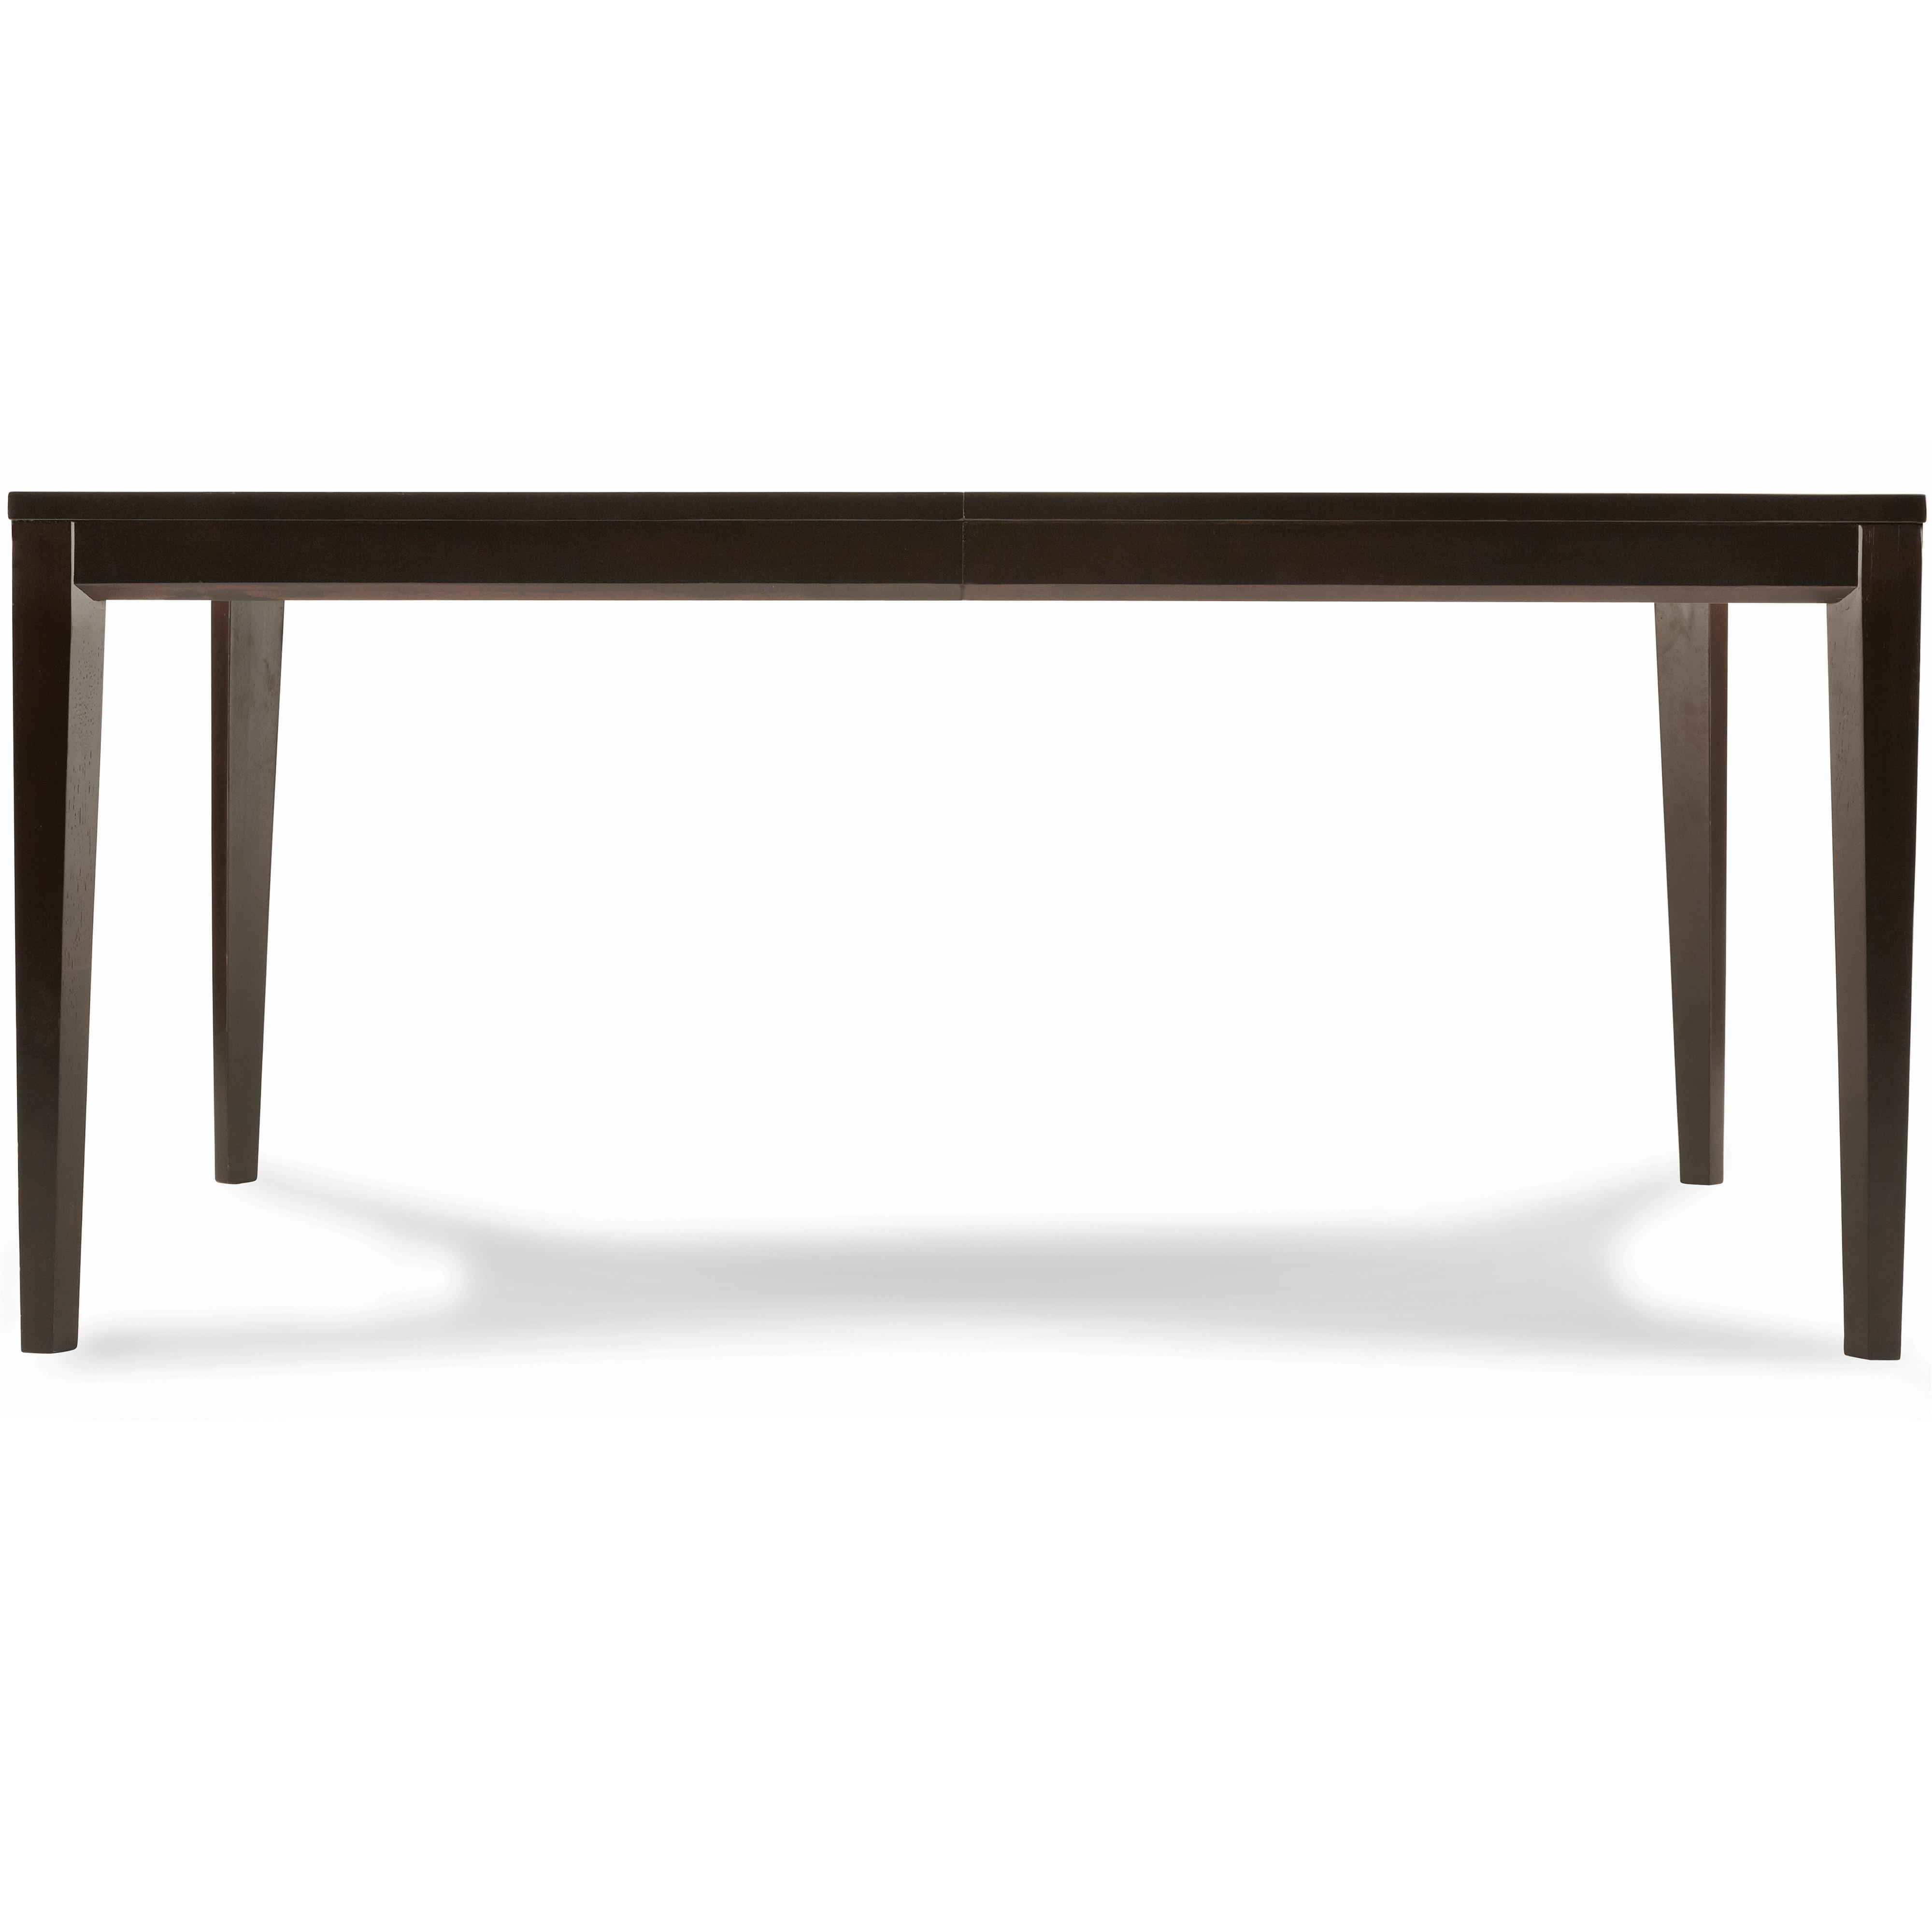 Belfort Select East Gate Rectangular Dining Table - Item Number: 355-150